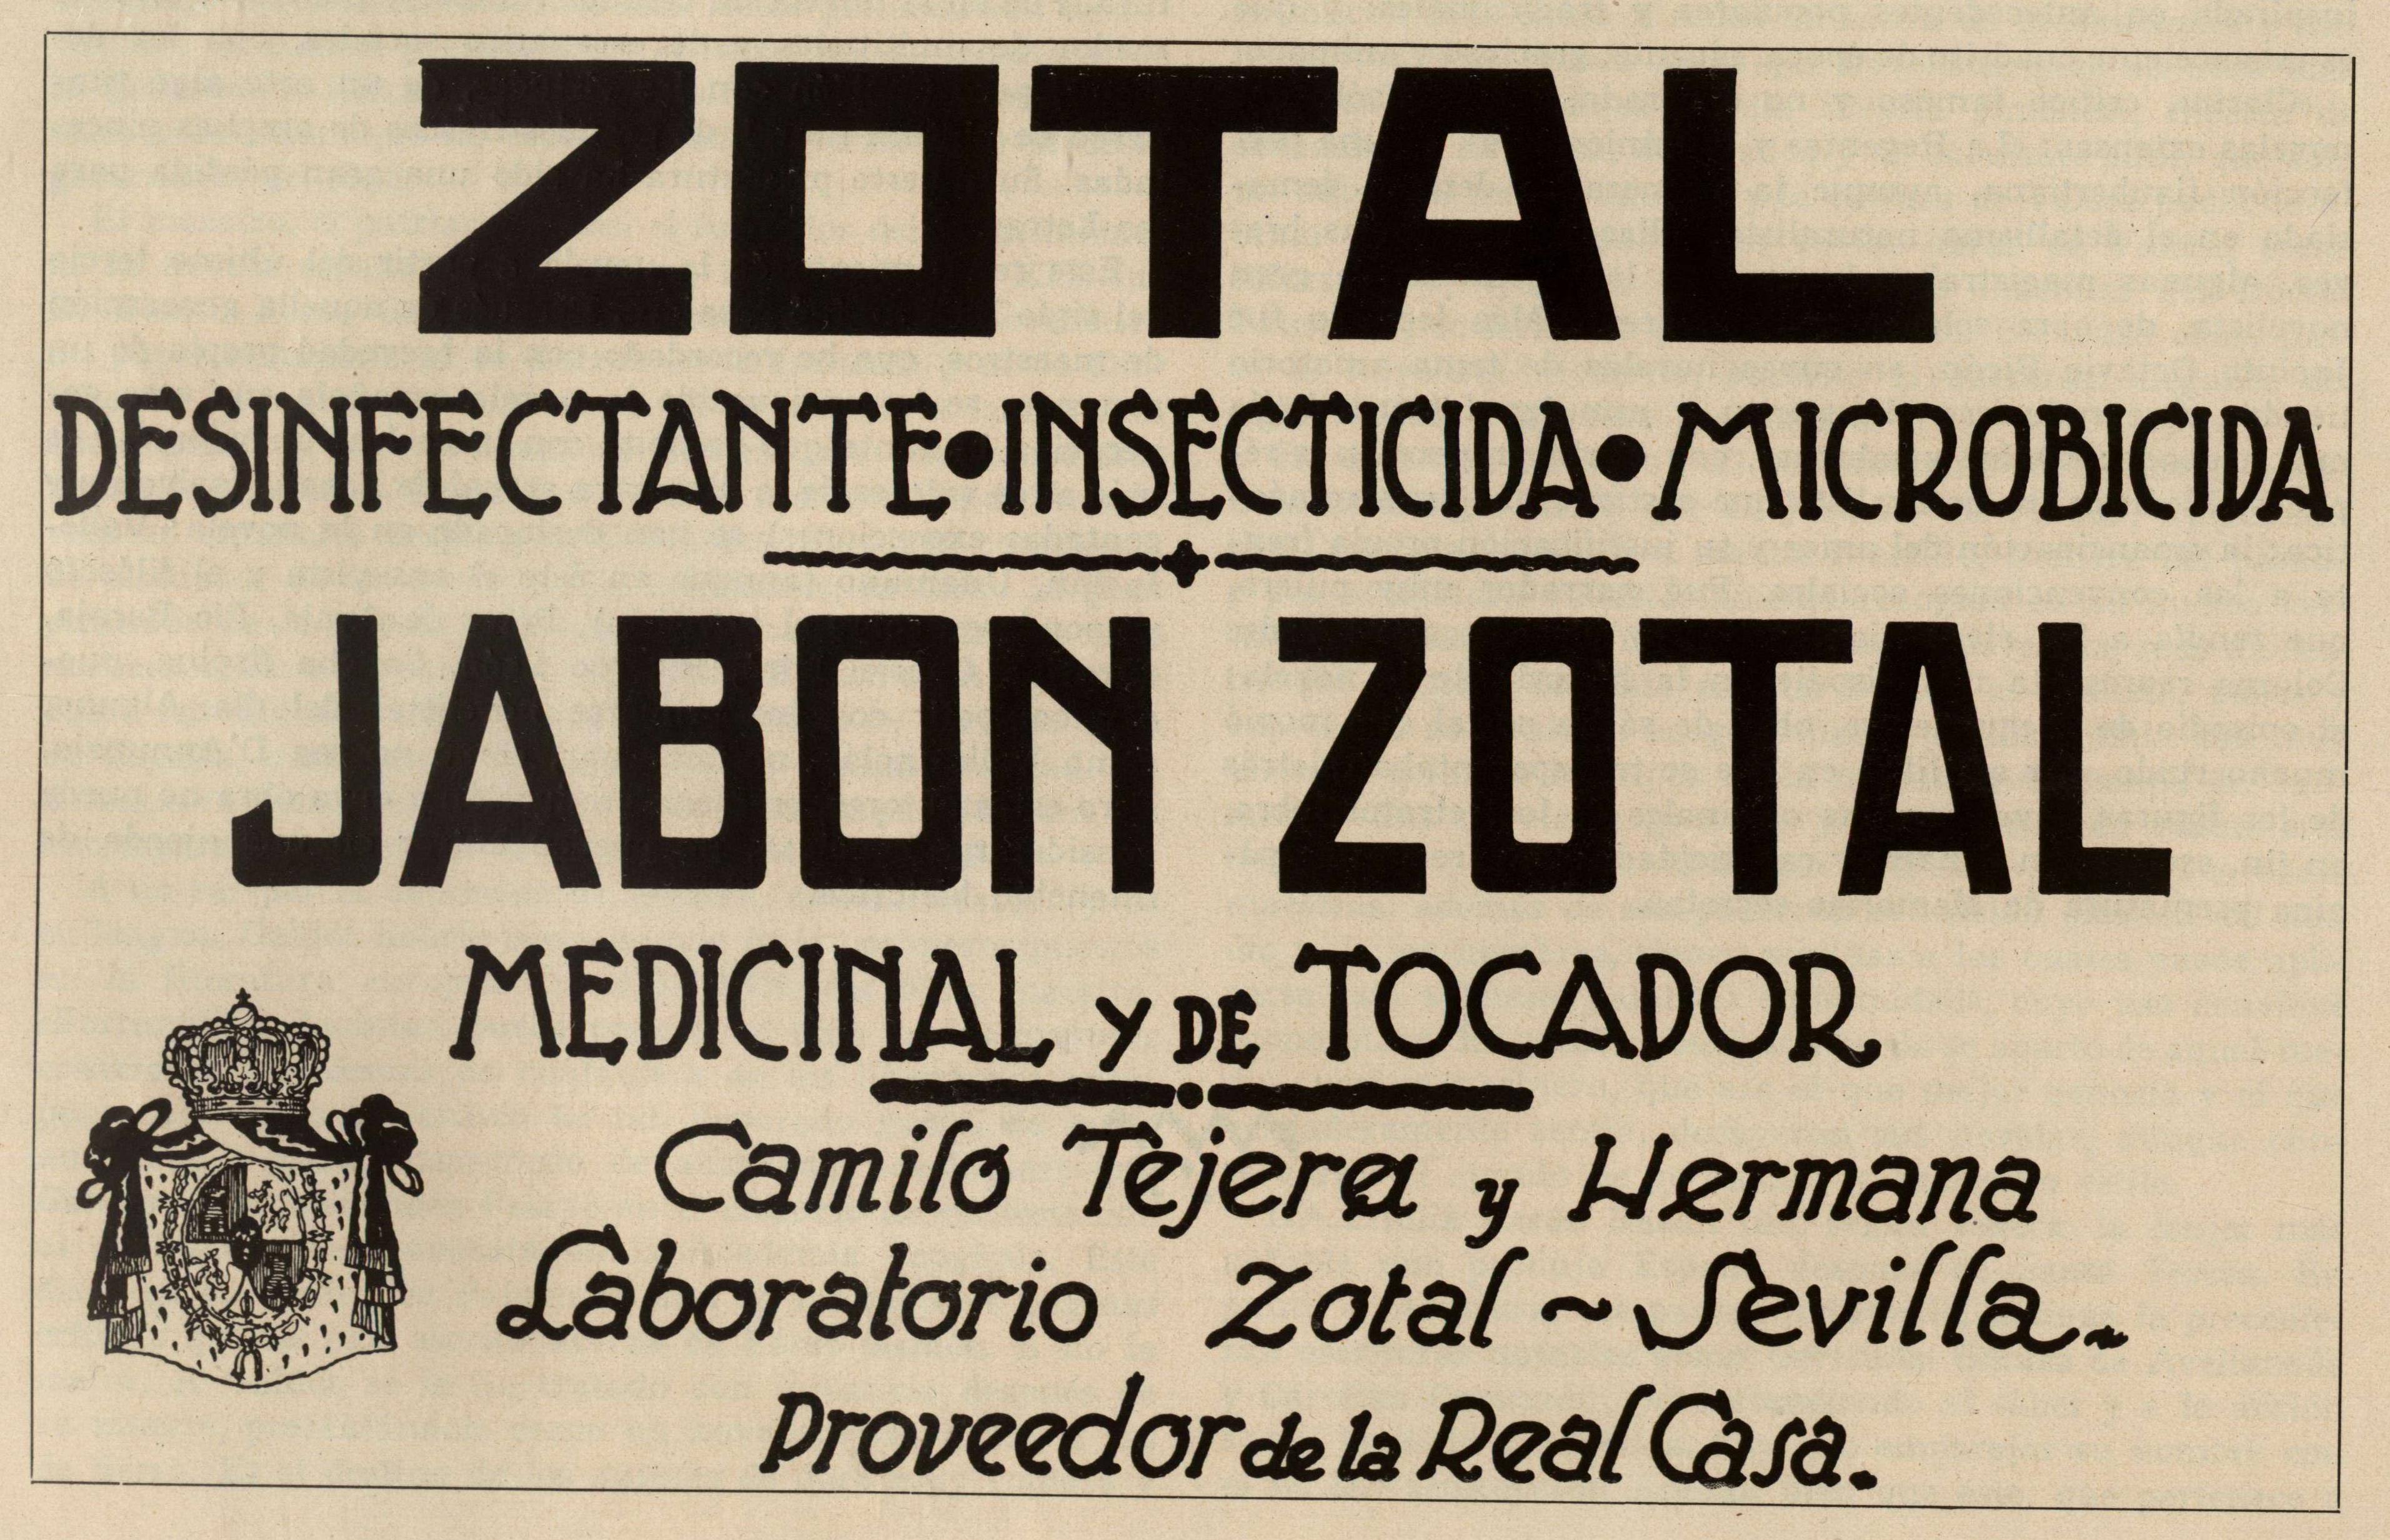 Jabón ZOTAL